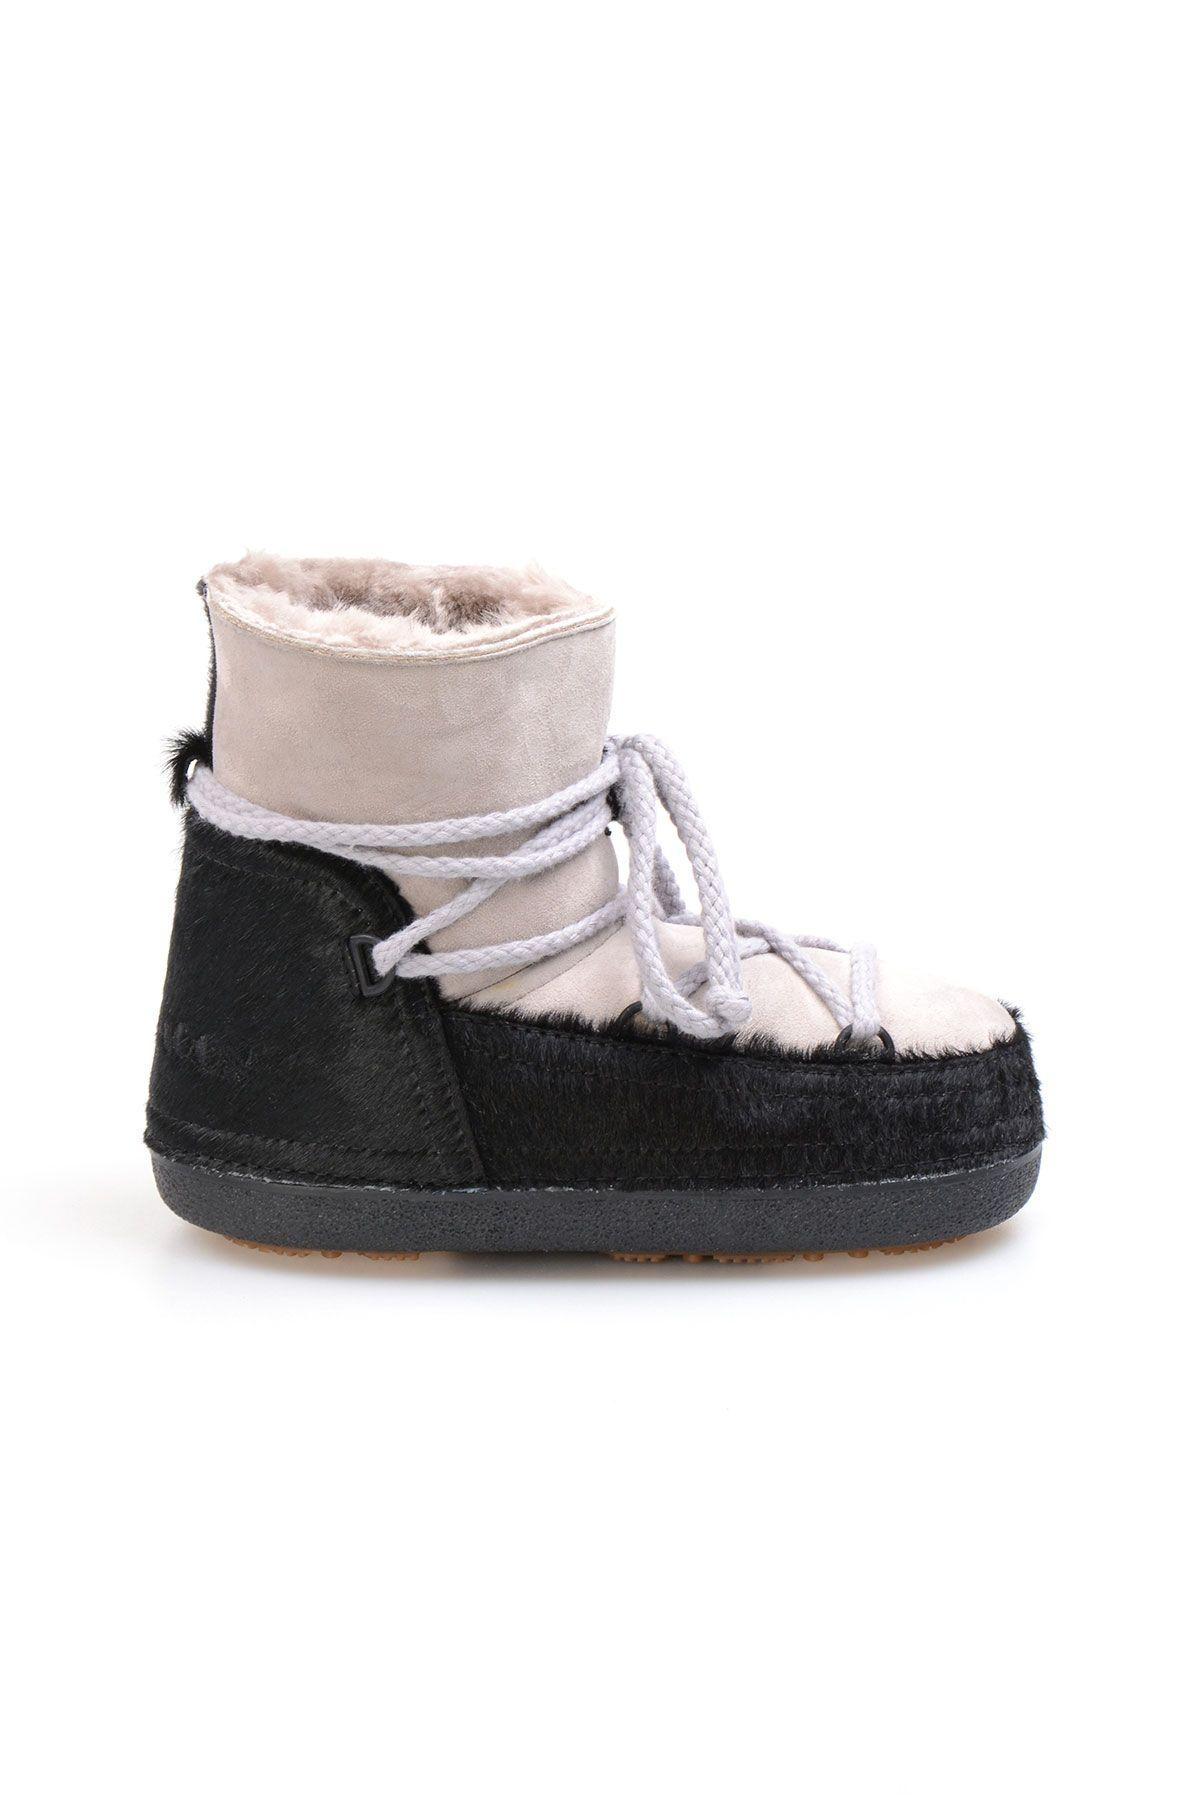 Cool Moon Genuine Sheepskin Women's Snow Boots 251114 Gray